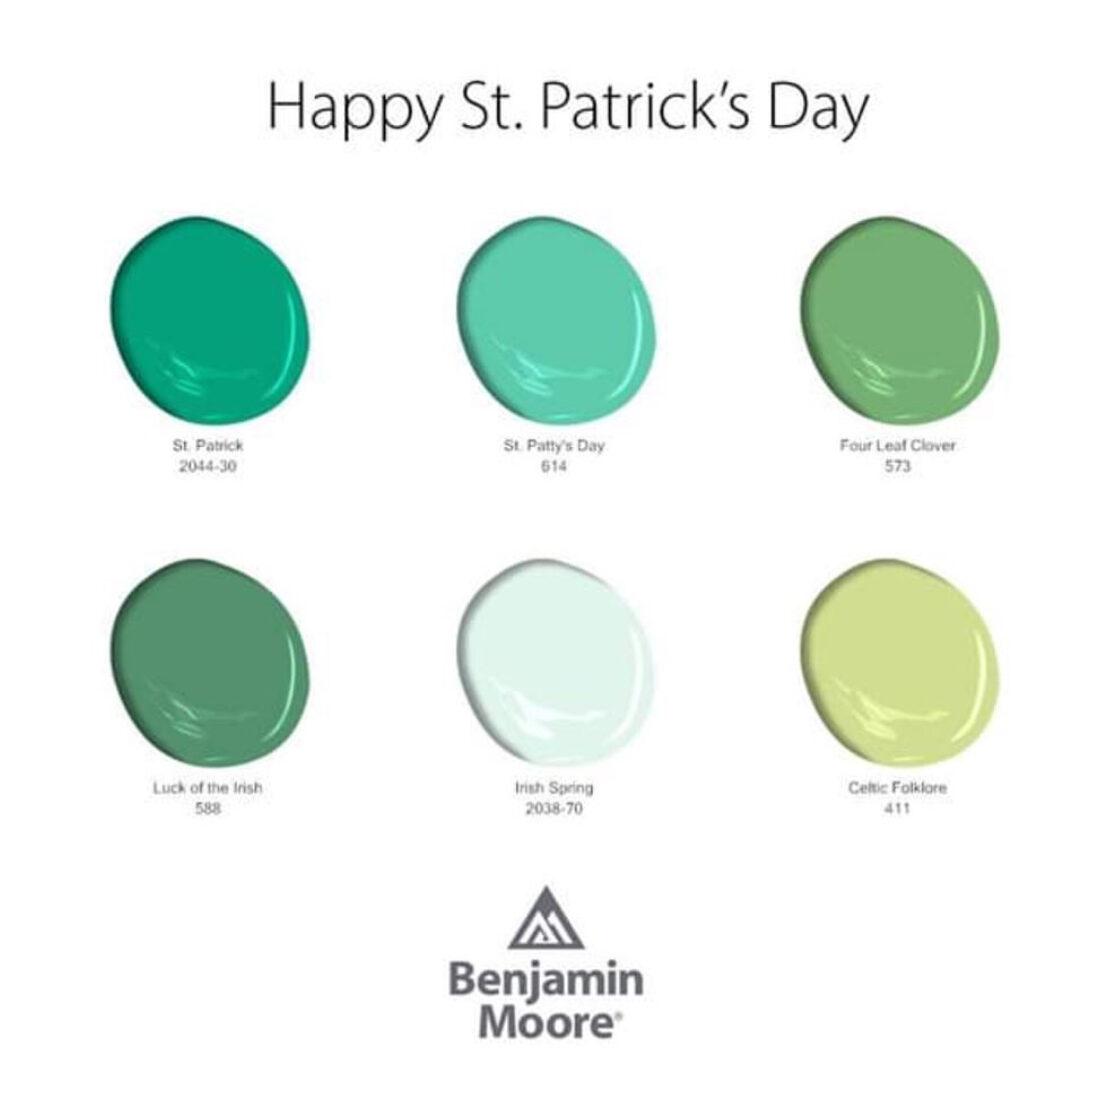 St. Patrick's Day Colors